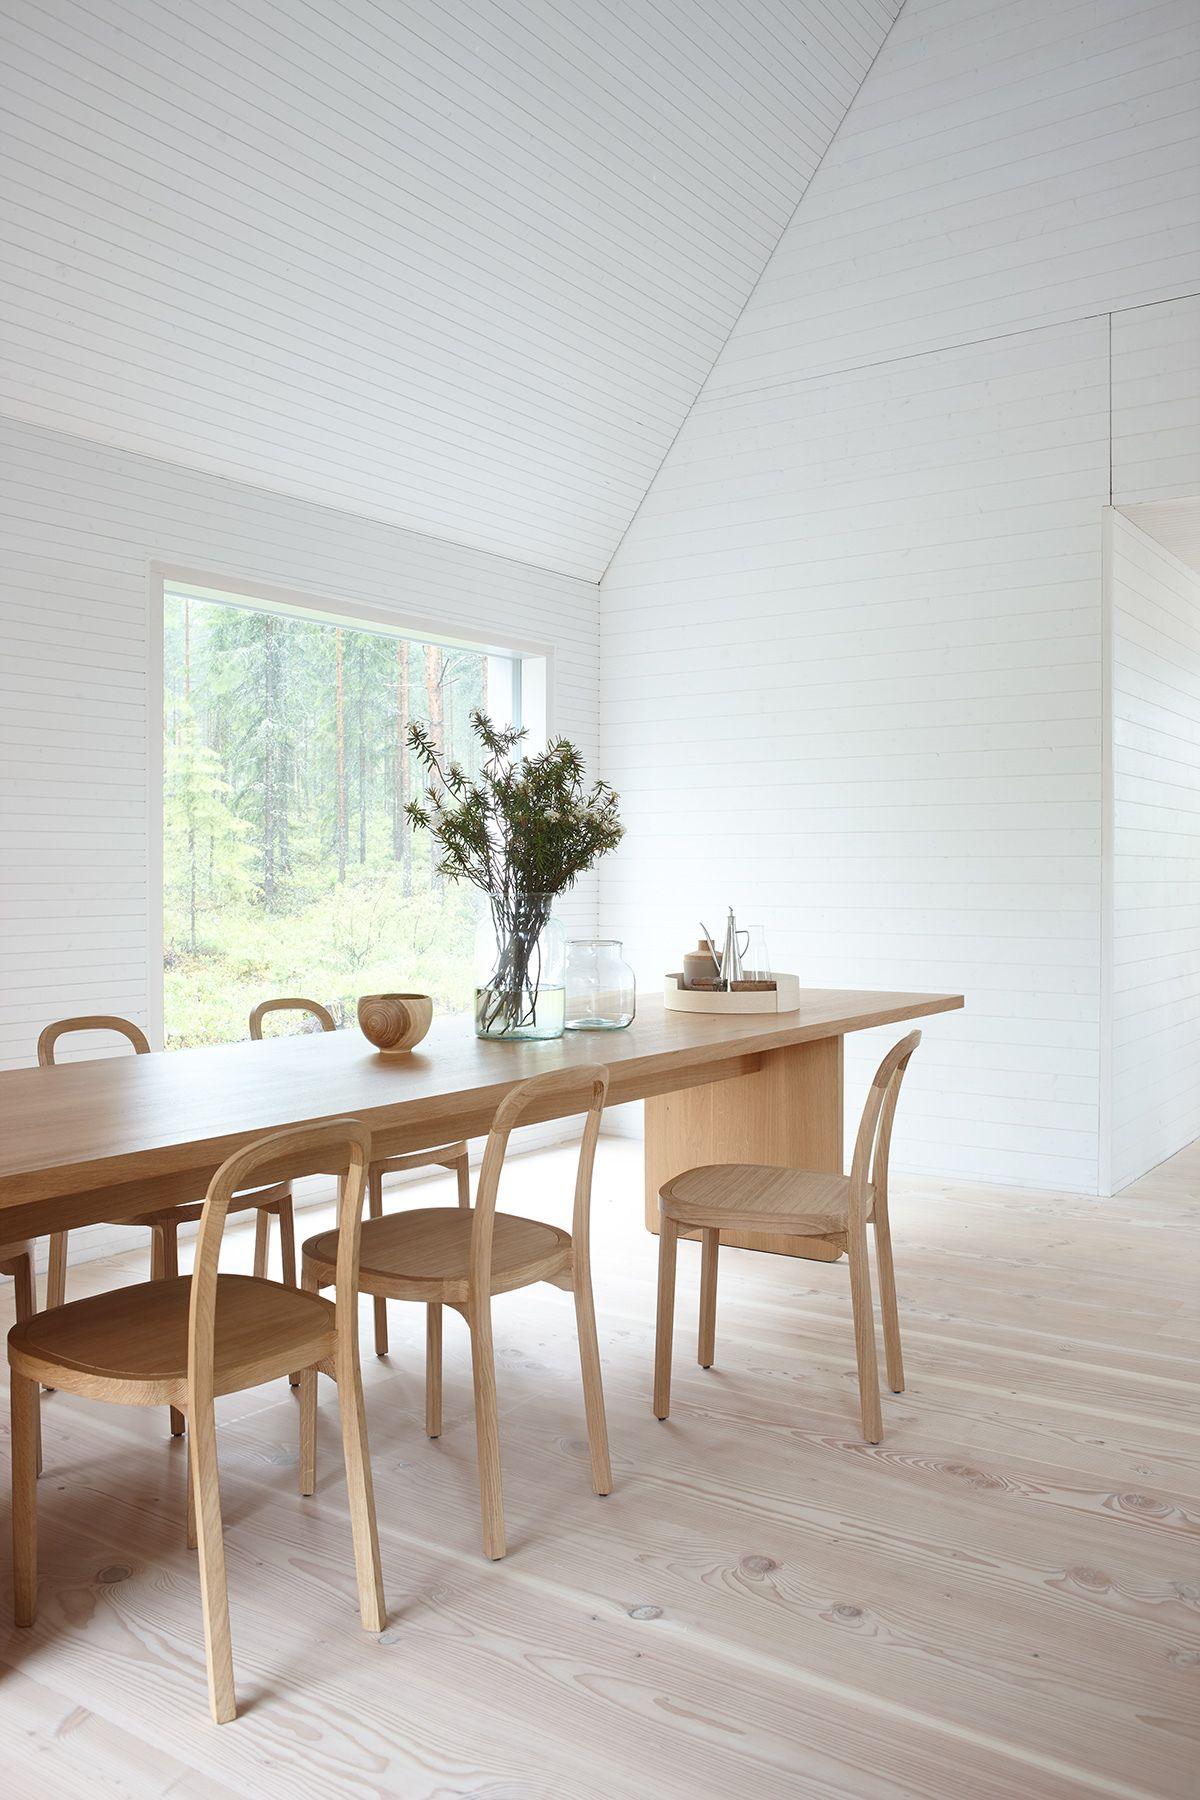 House K by Hirvilammi Architects - Dwell